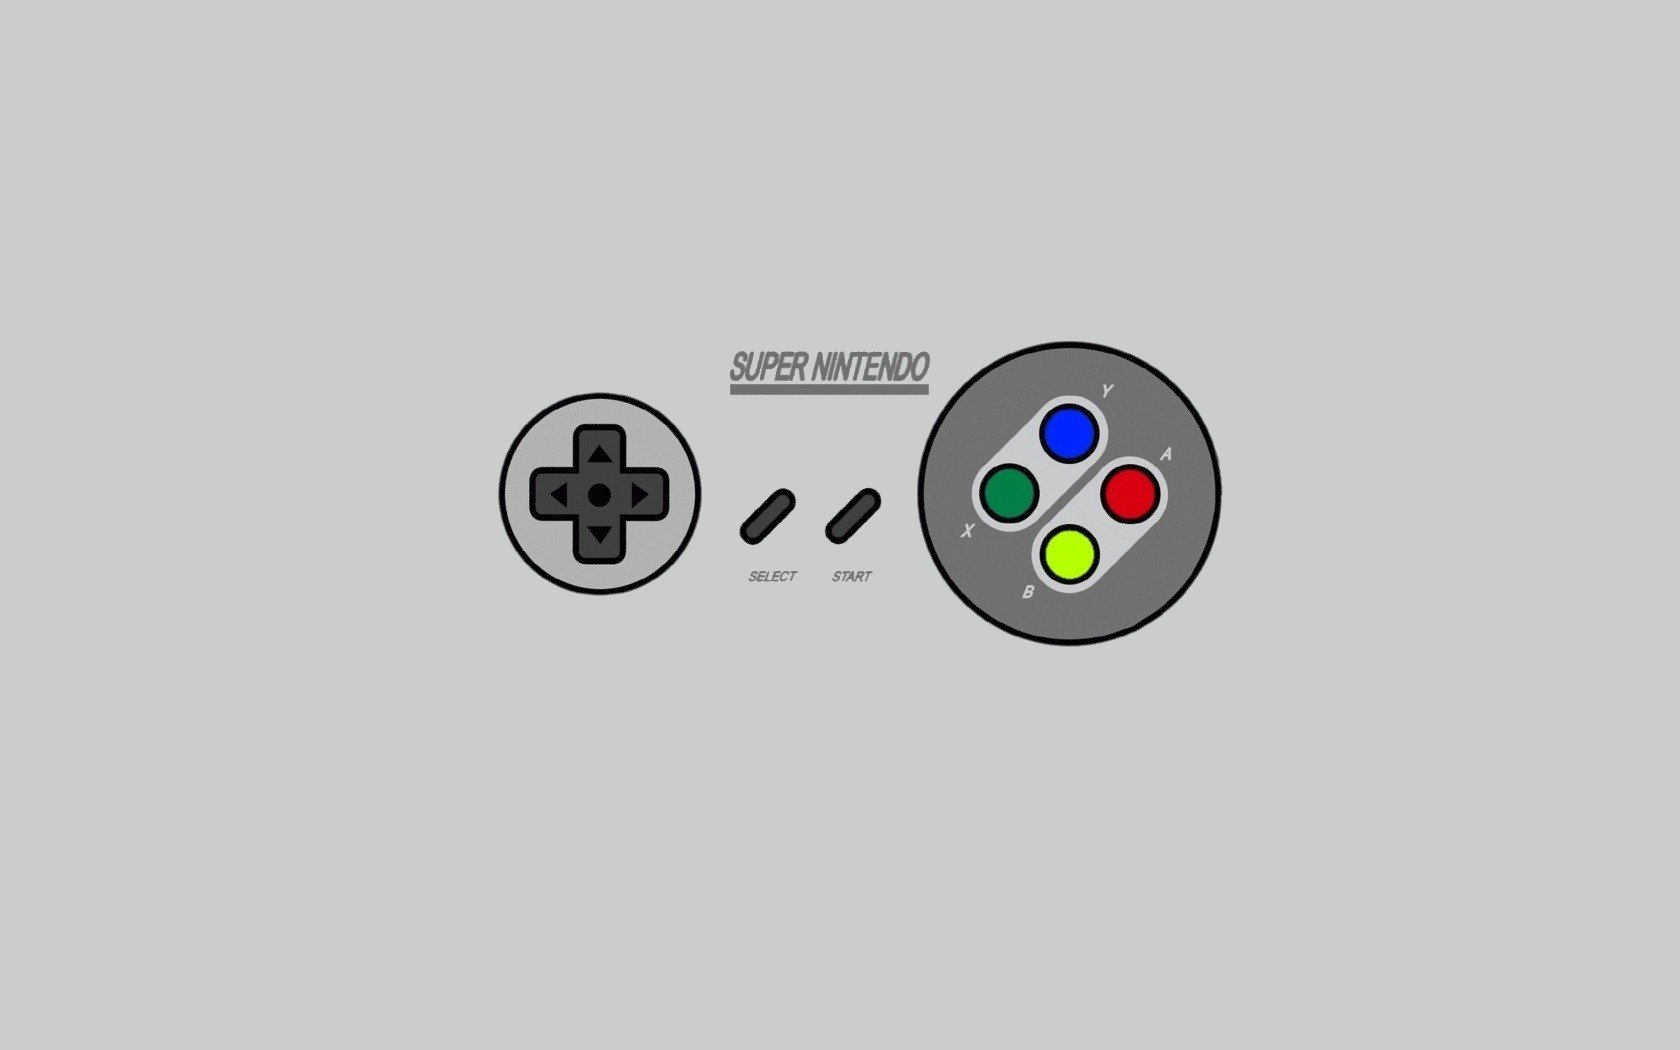 Nintendo Minimalistic Super Nintendo Simple Background Wallpaper